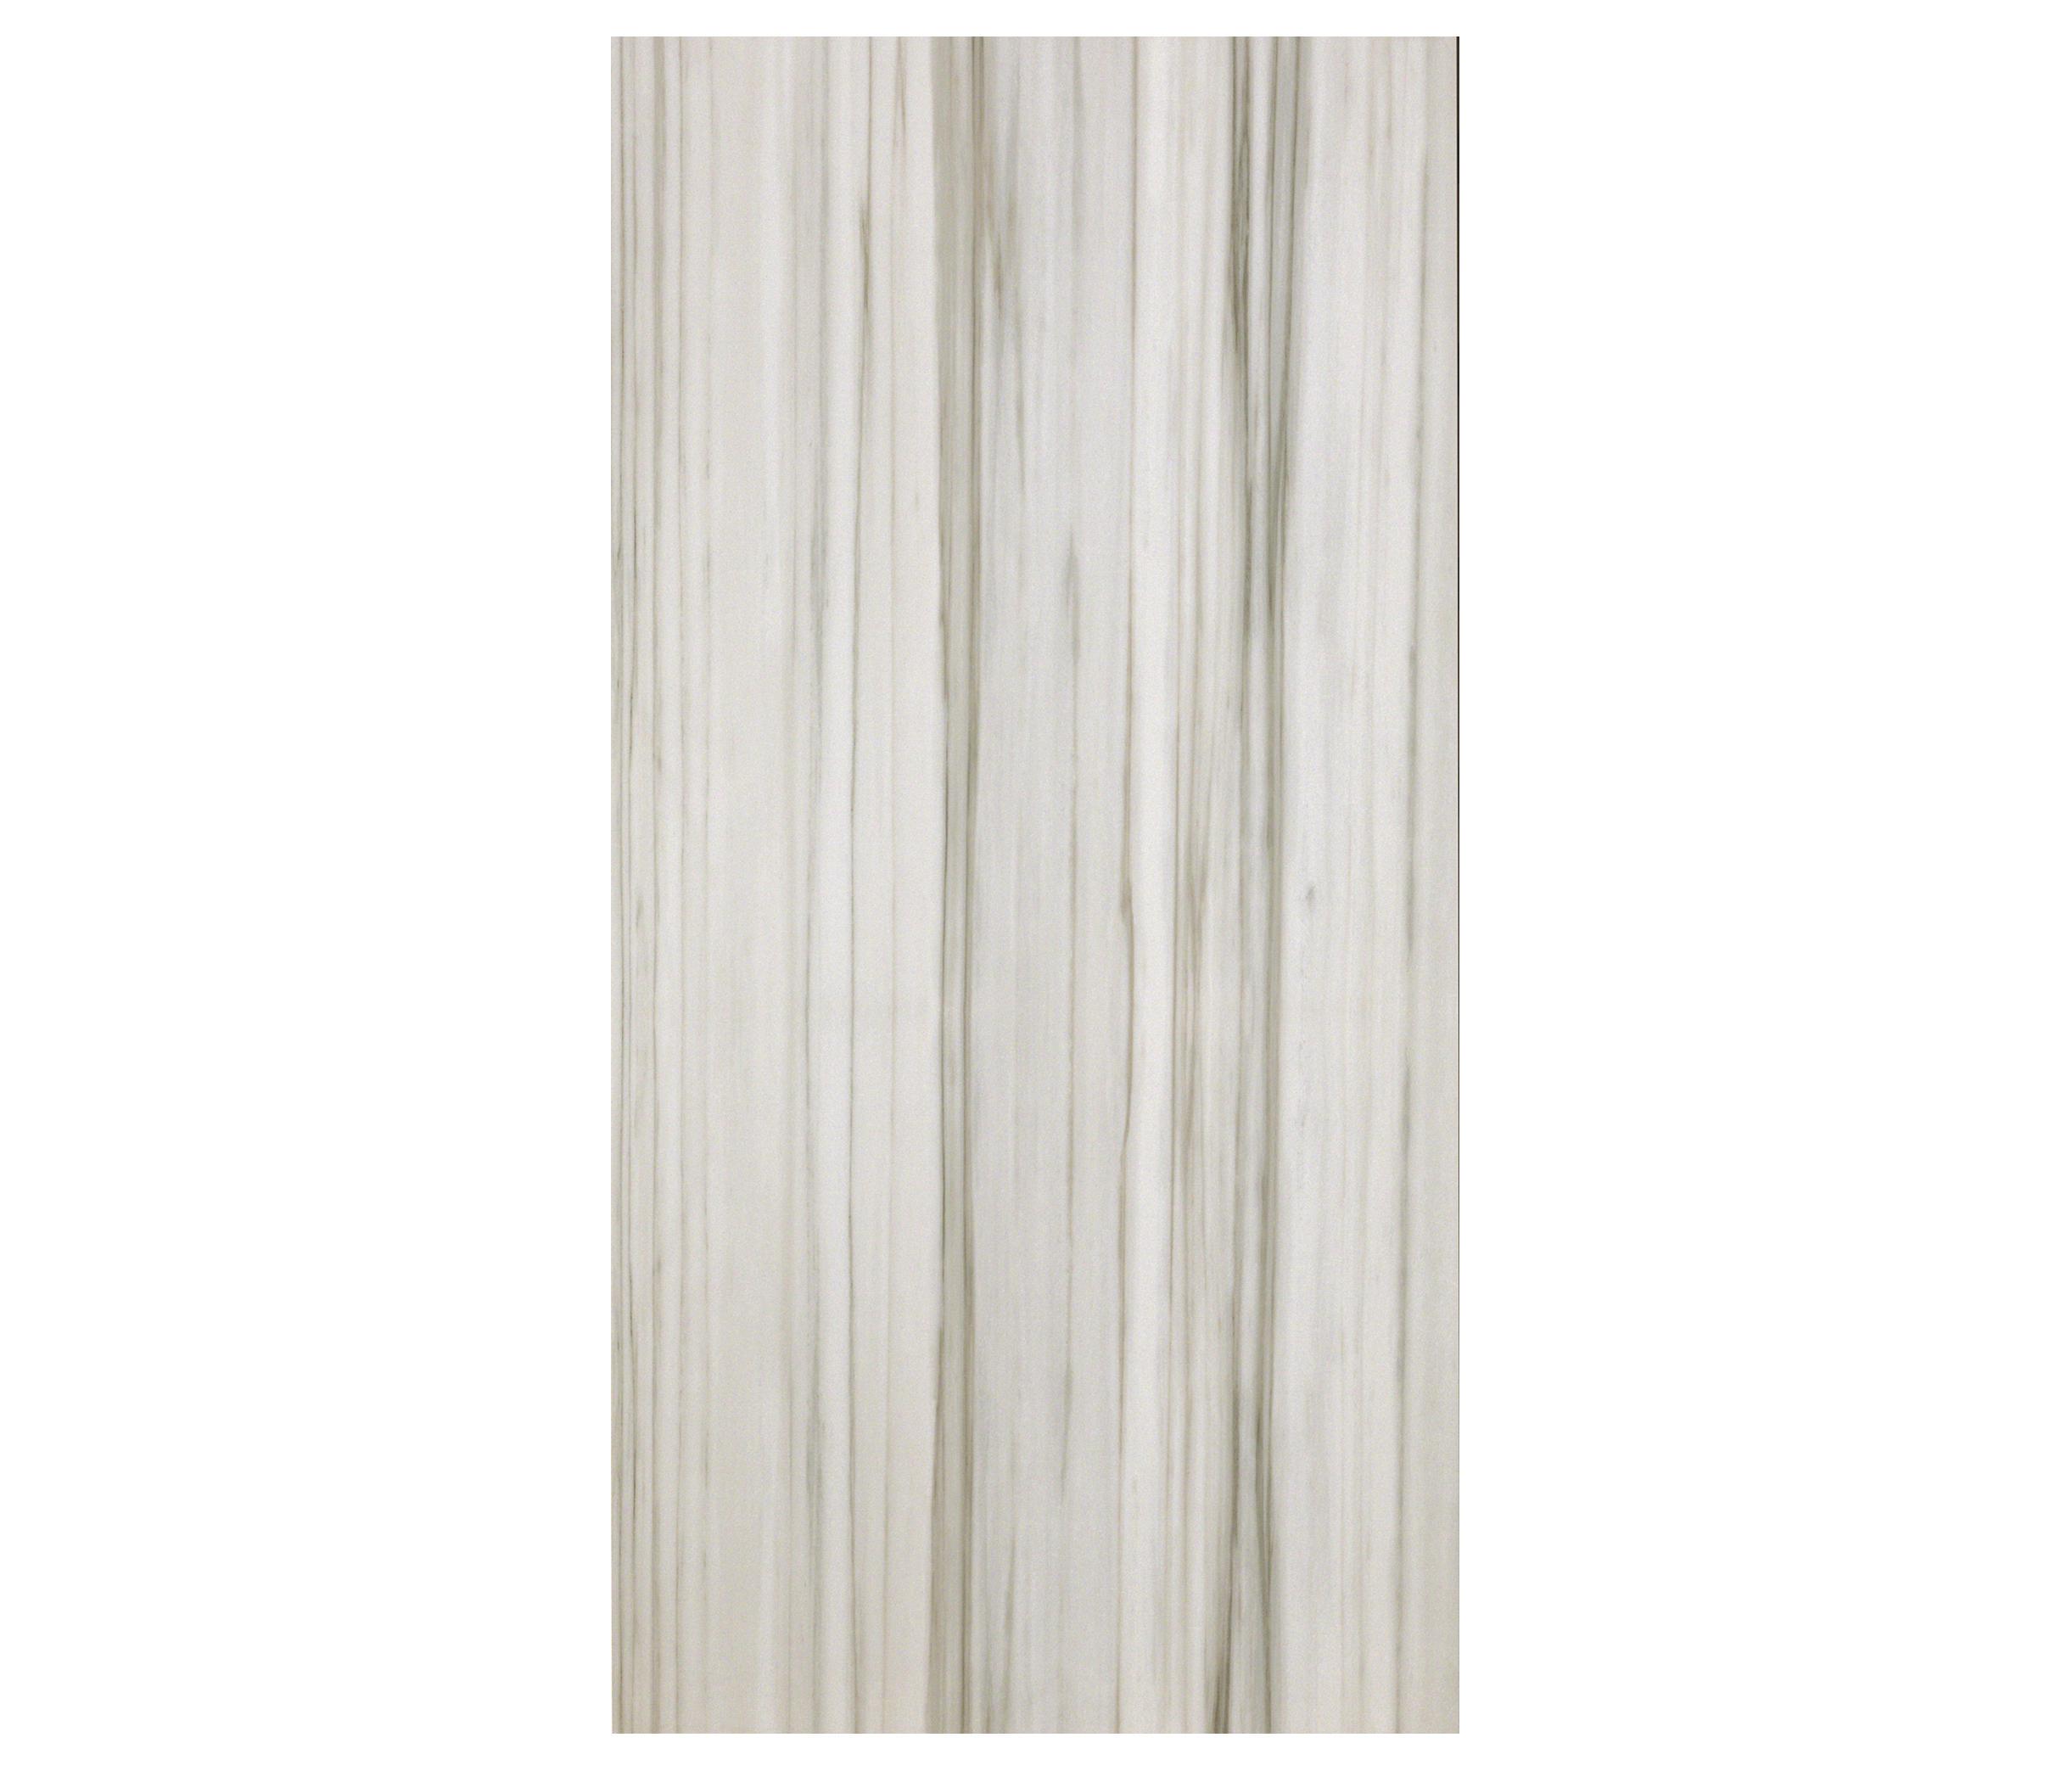 marmoker zebrino fassadenplatten von casalgrande padana. Black Bedroom Furniture Sets. Home Design Ideas